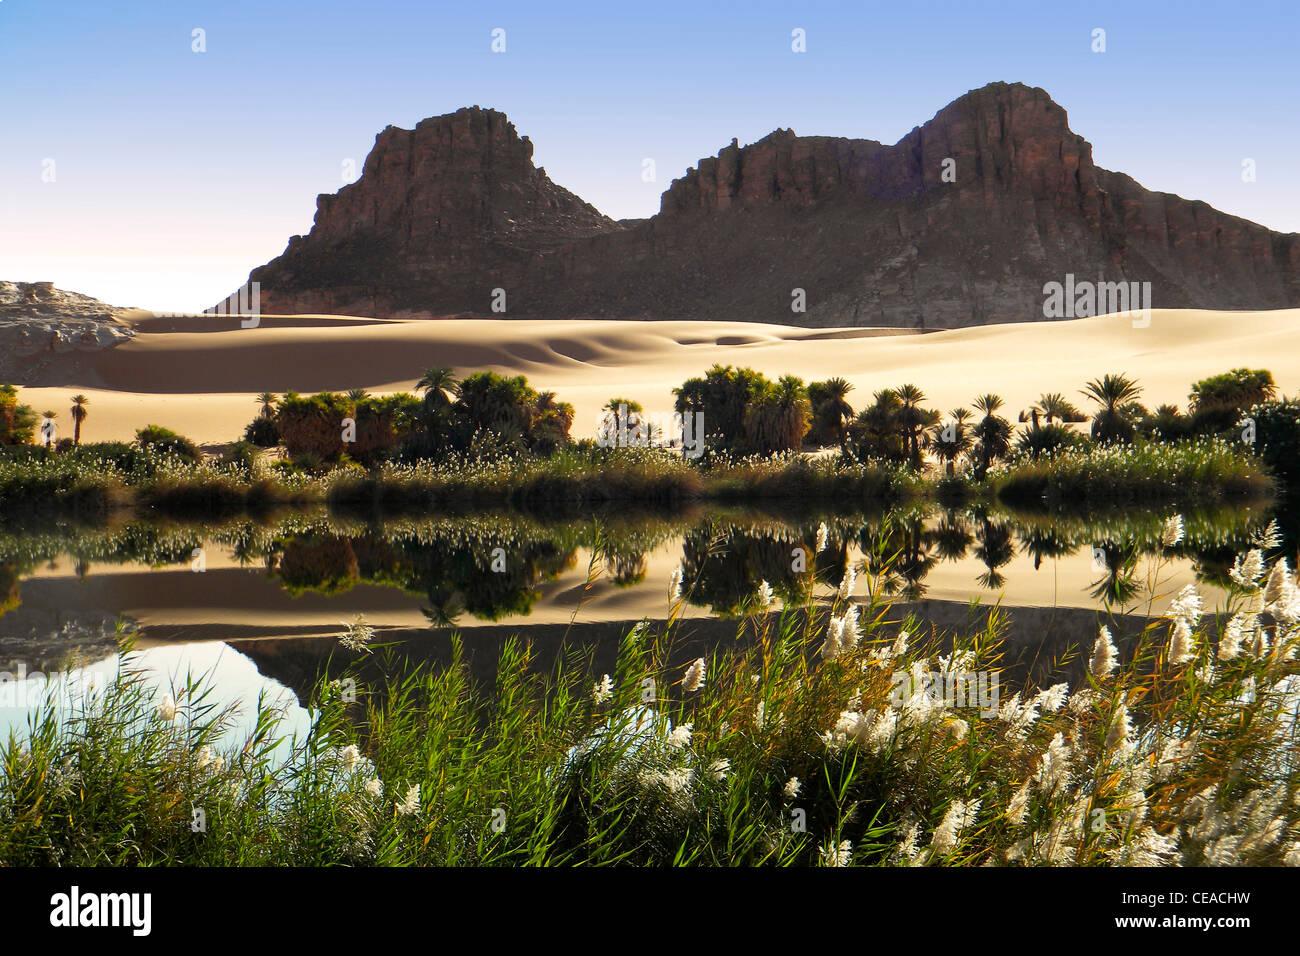 Ounianga lake, Erdi region, Chad - Stock Image